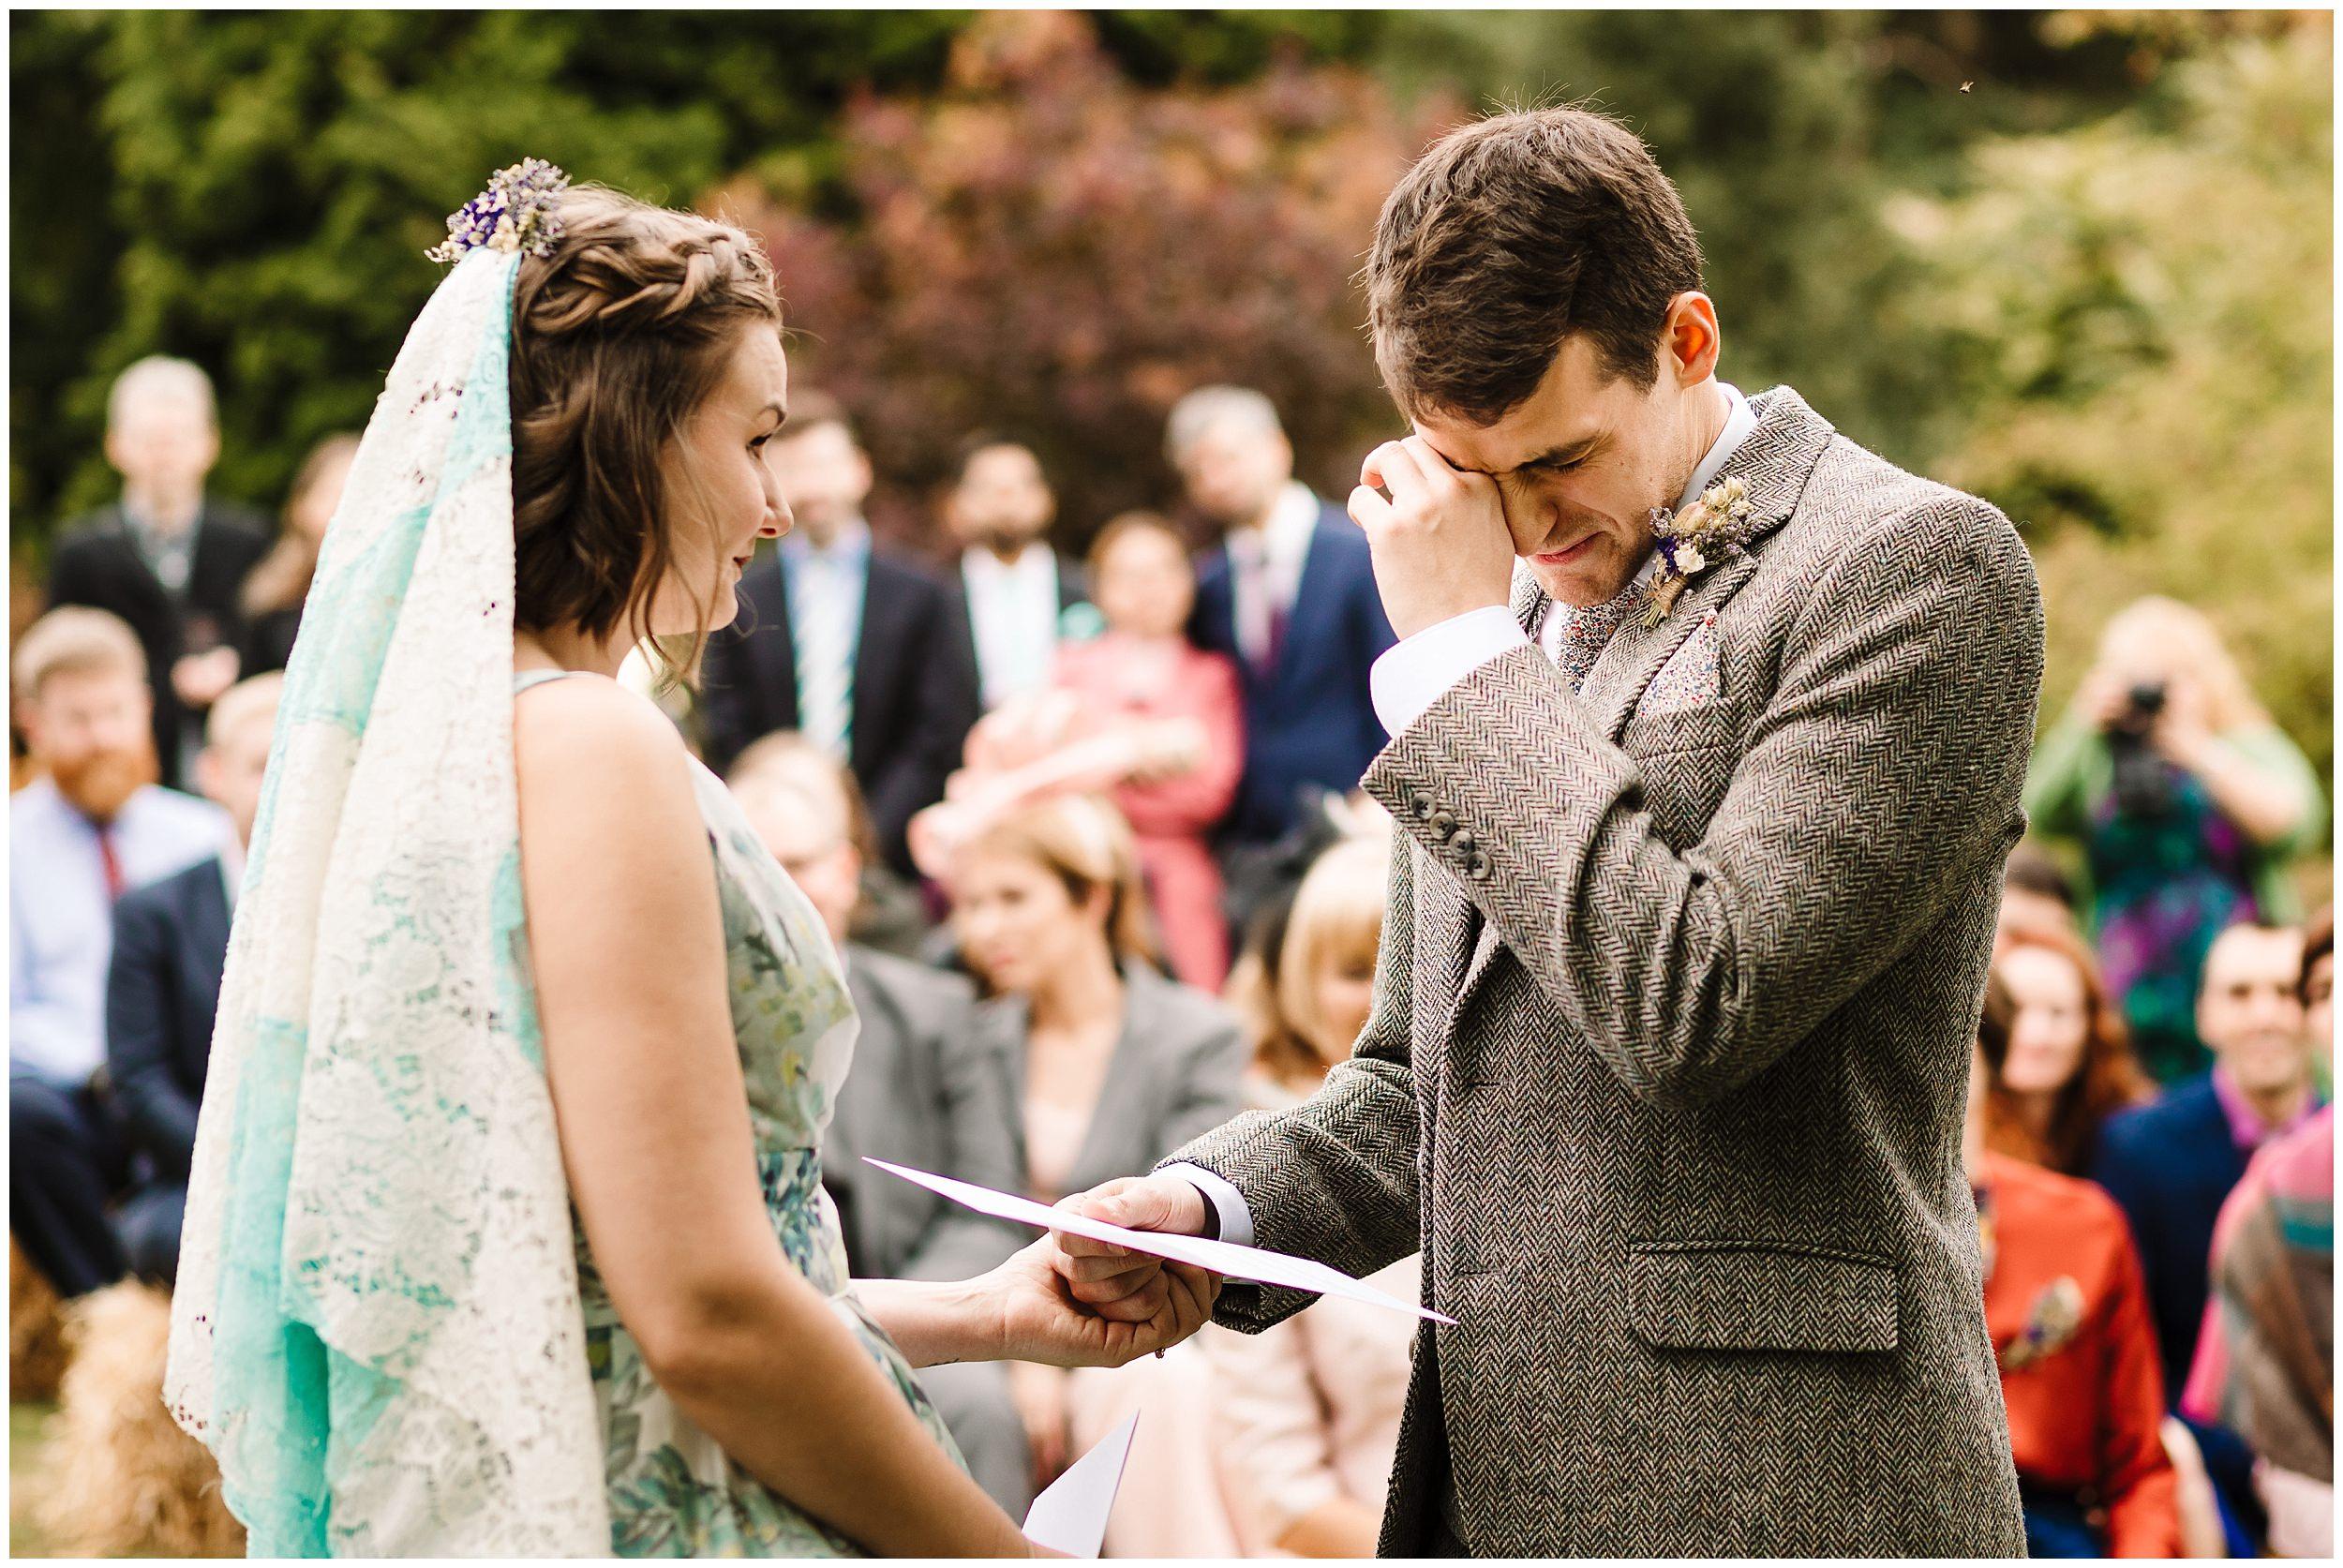 YORKSHIRE OUTDOOR WEDDING PHOTOGRAPHER LUCY ALEX_0017.jpg